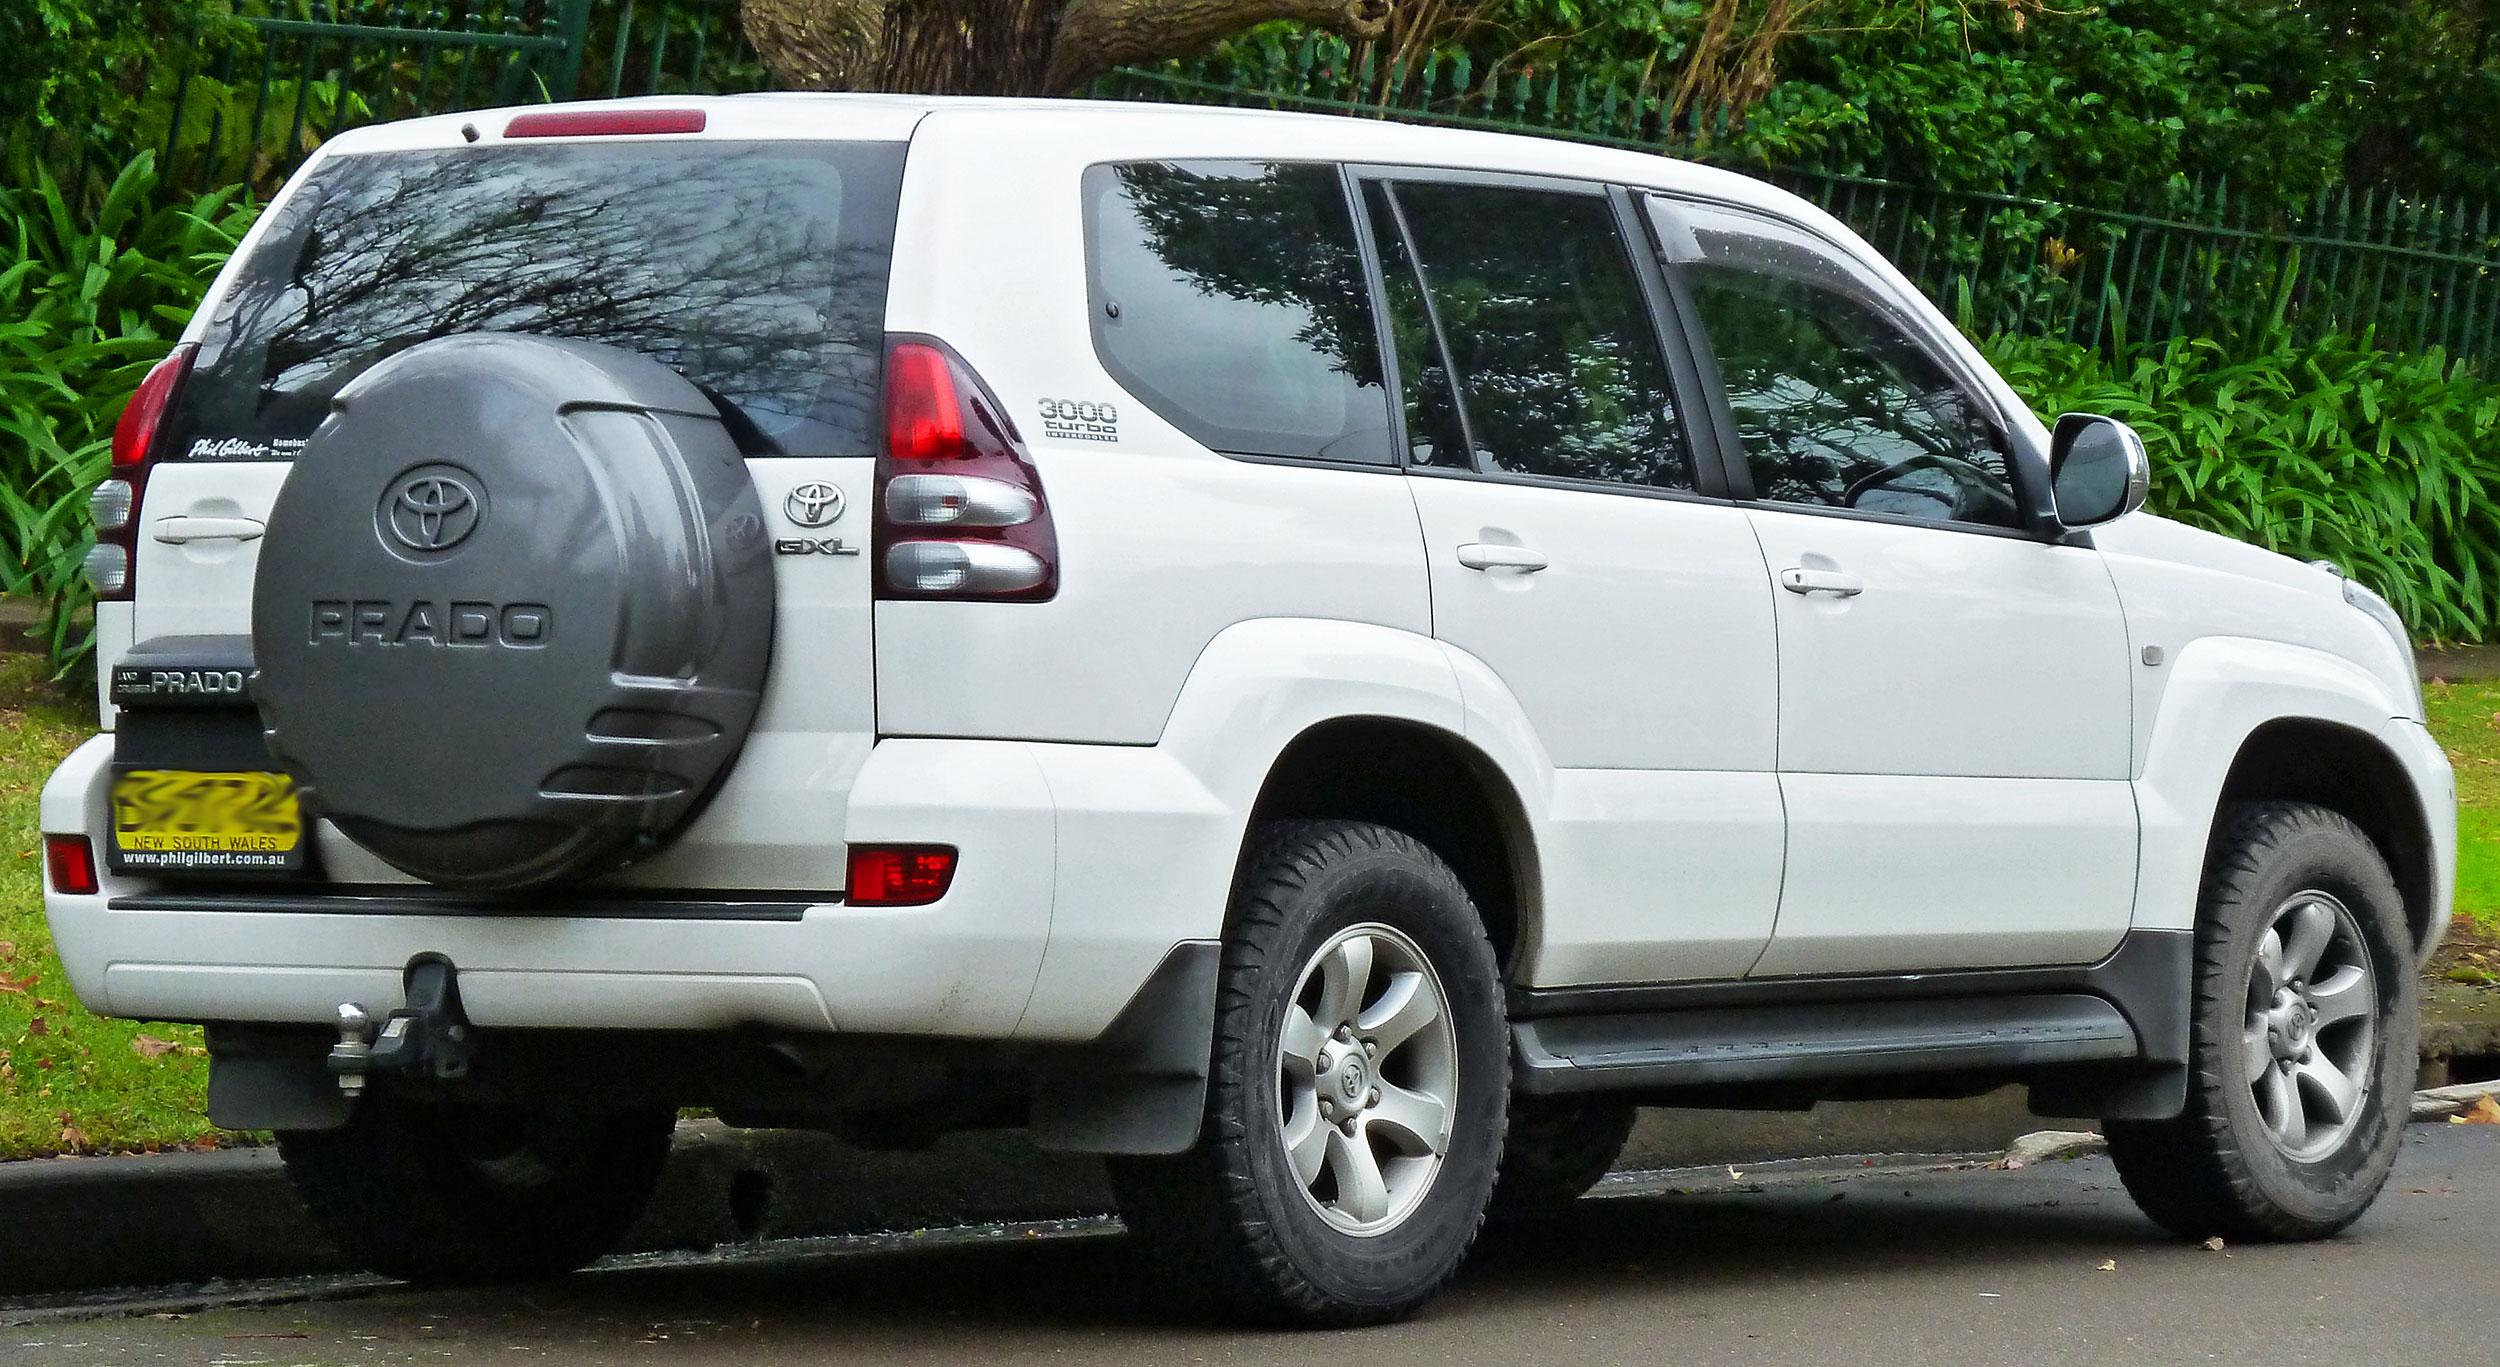 SL-036034PRADO ® Toyota Prado Third Brake LightType